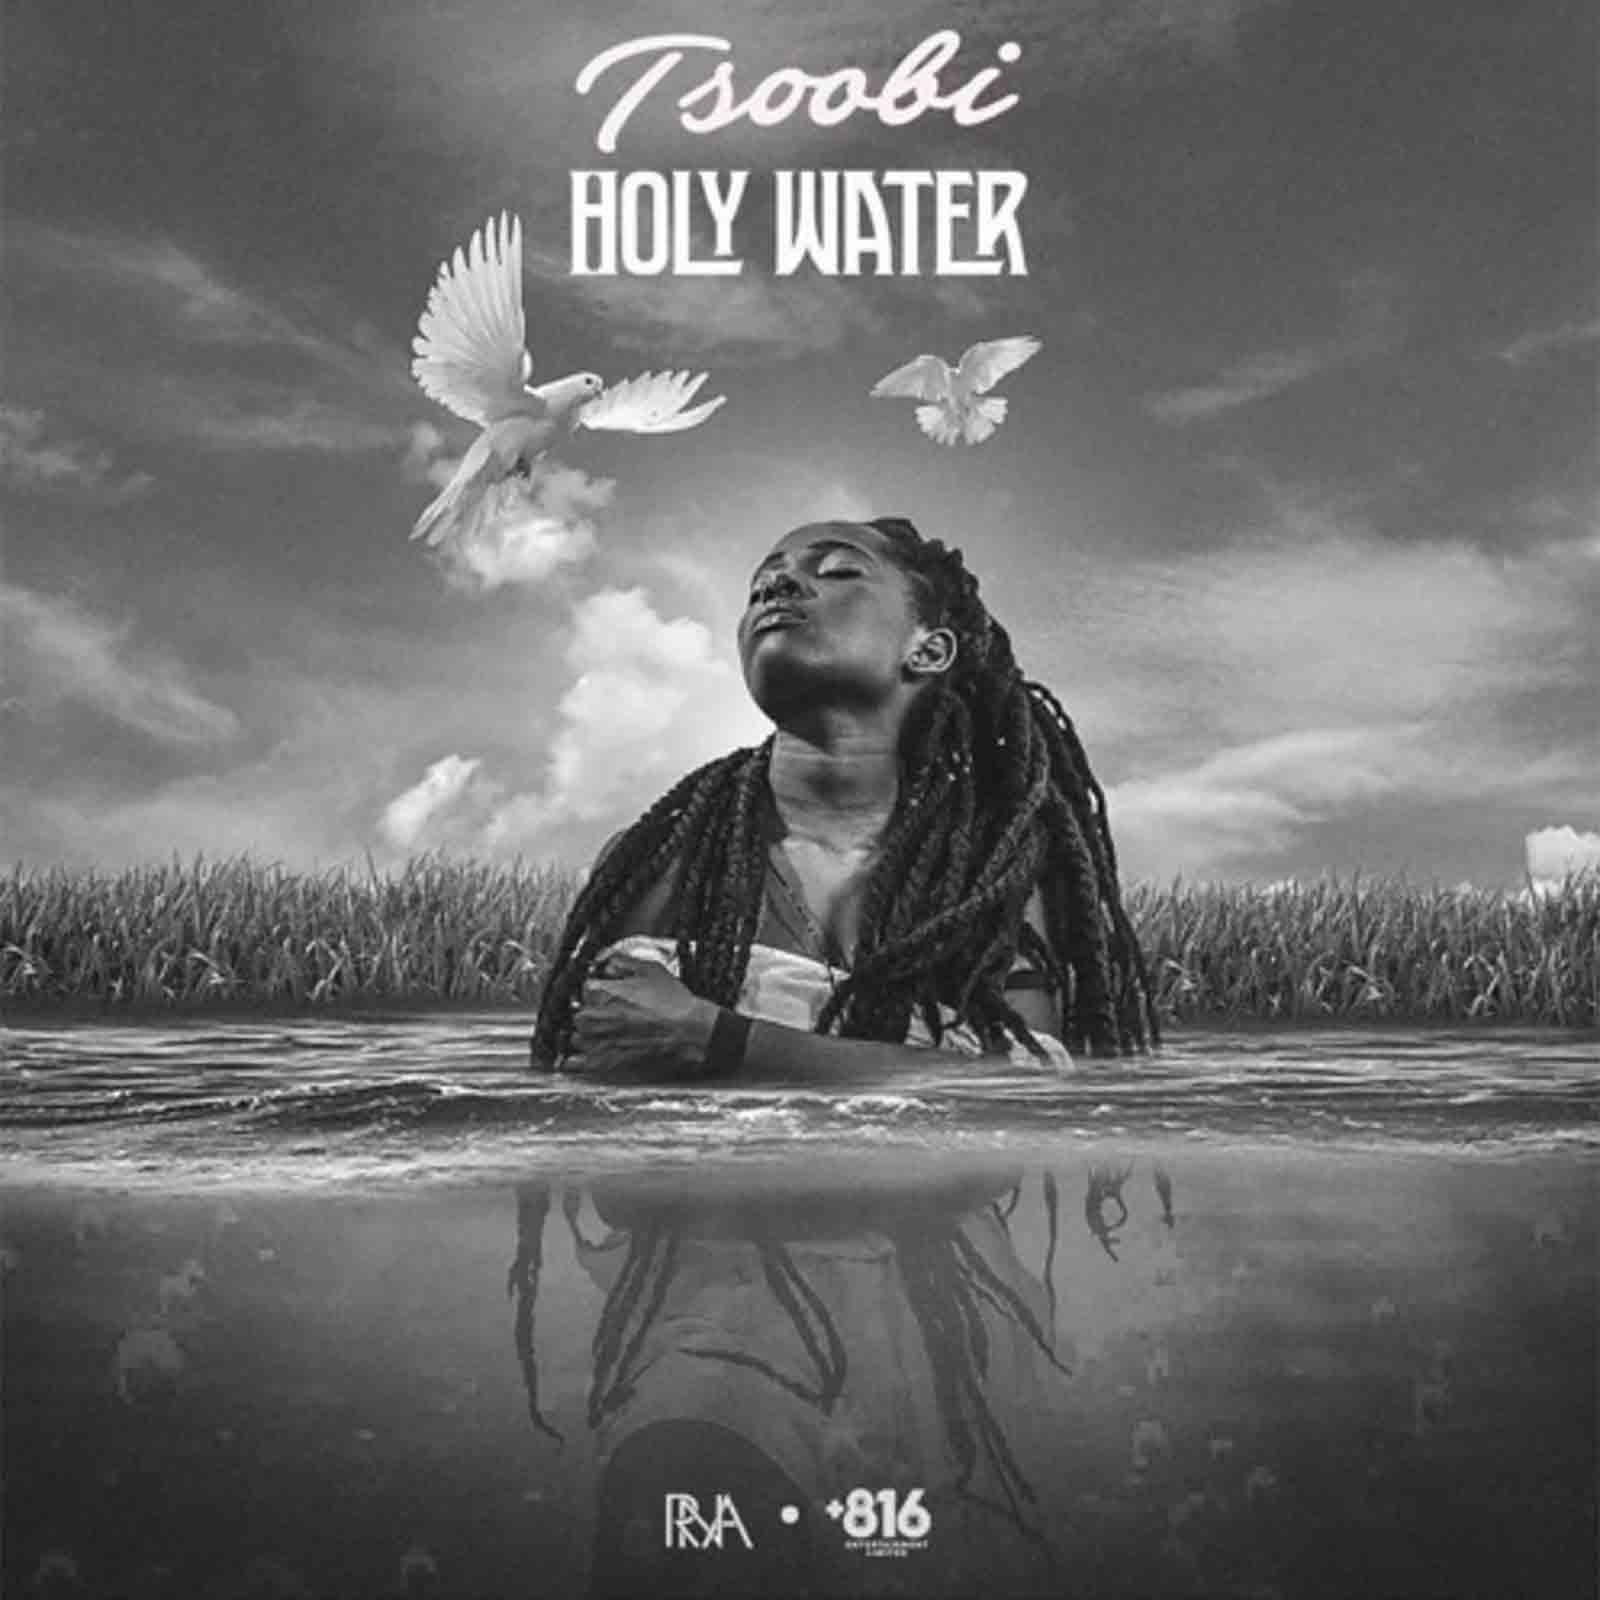 Holy Water by Tsoobi